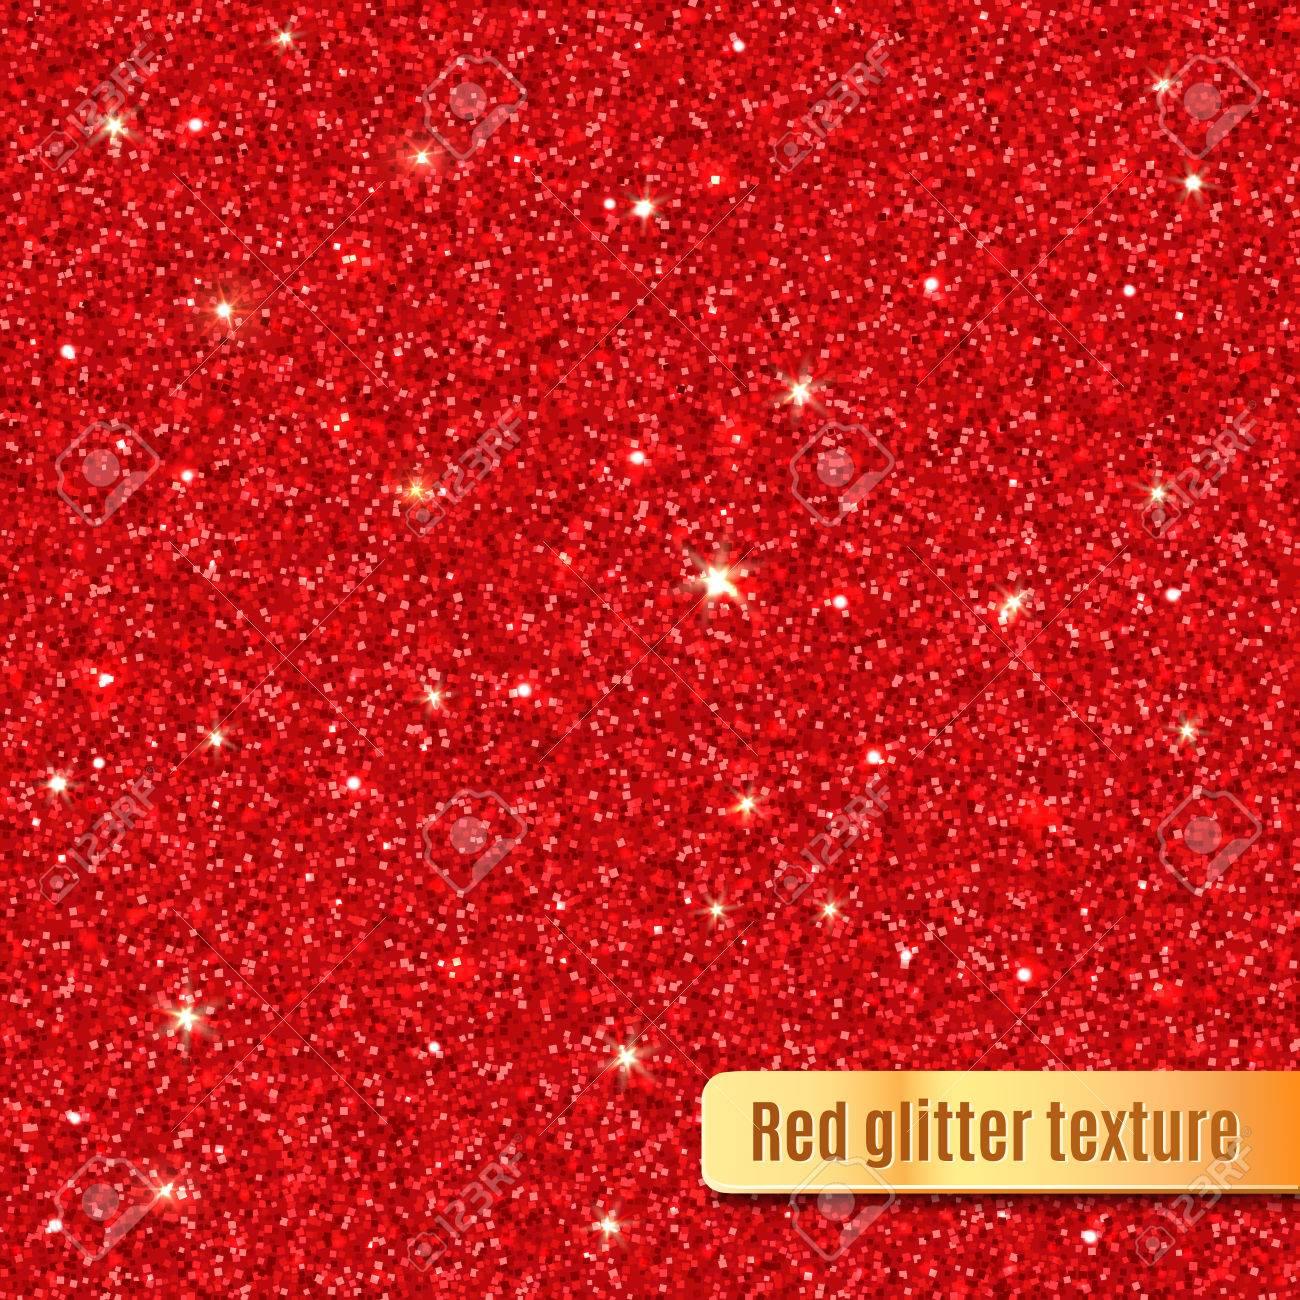 Red glitter texture. - 54017610